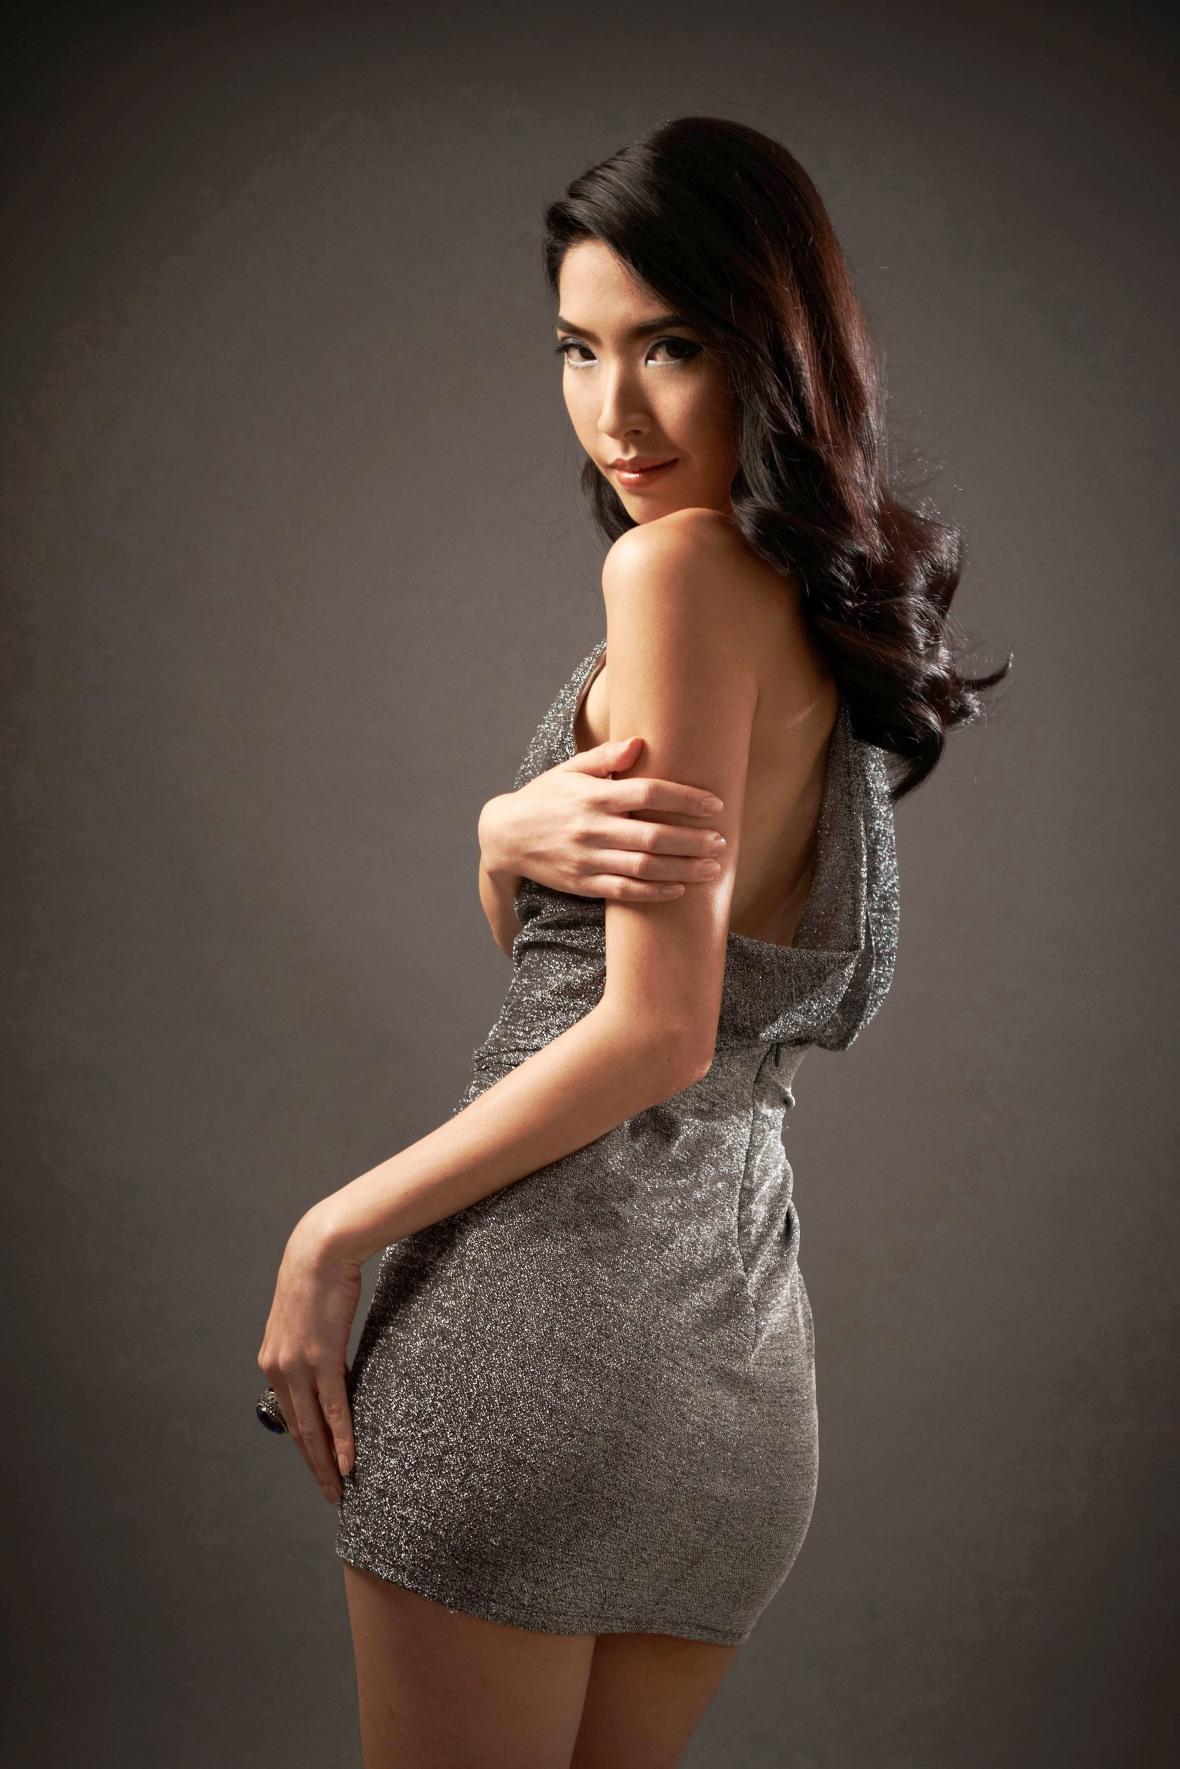 Alita@Model Society International (MSI) Modeling Agency in Bangkok Thailand By Miss Josie Sang โจซี่ โมเดลลิ่งเอเจนซี่